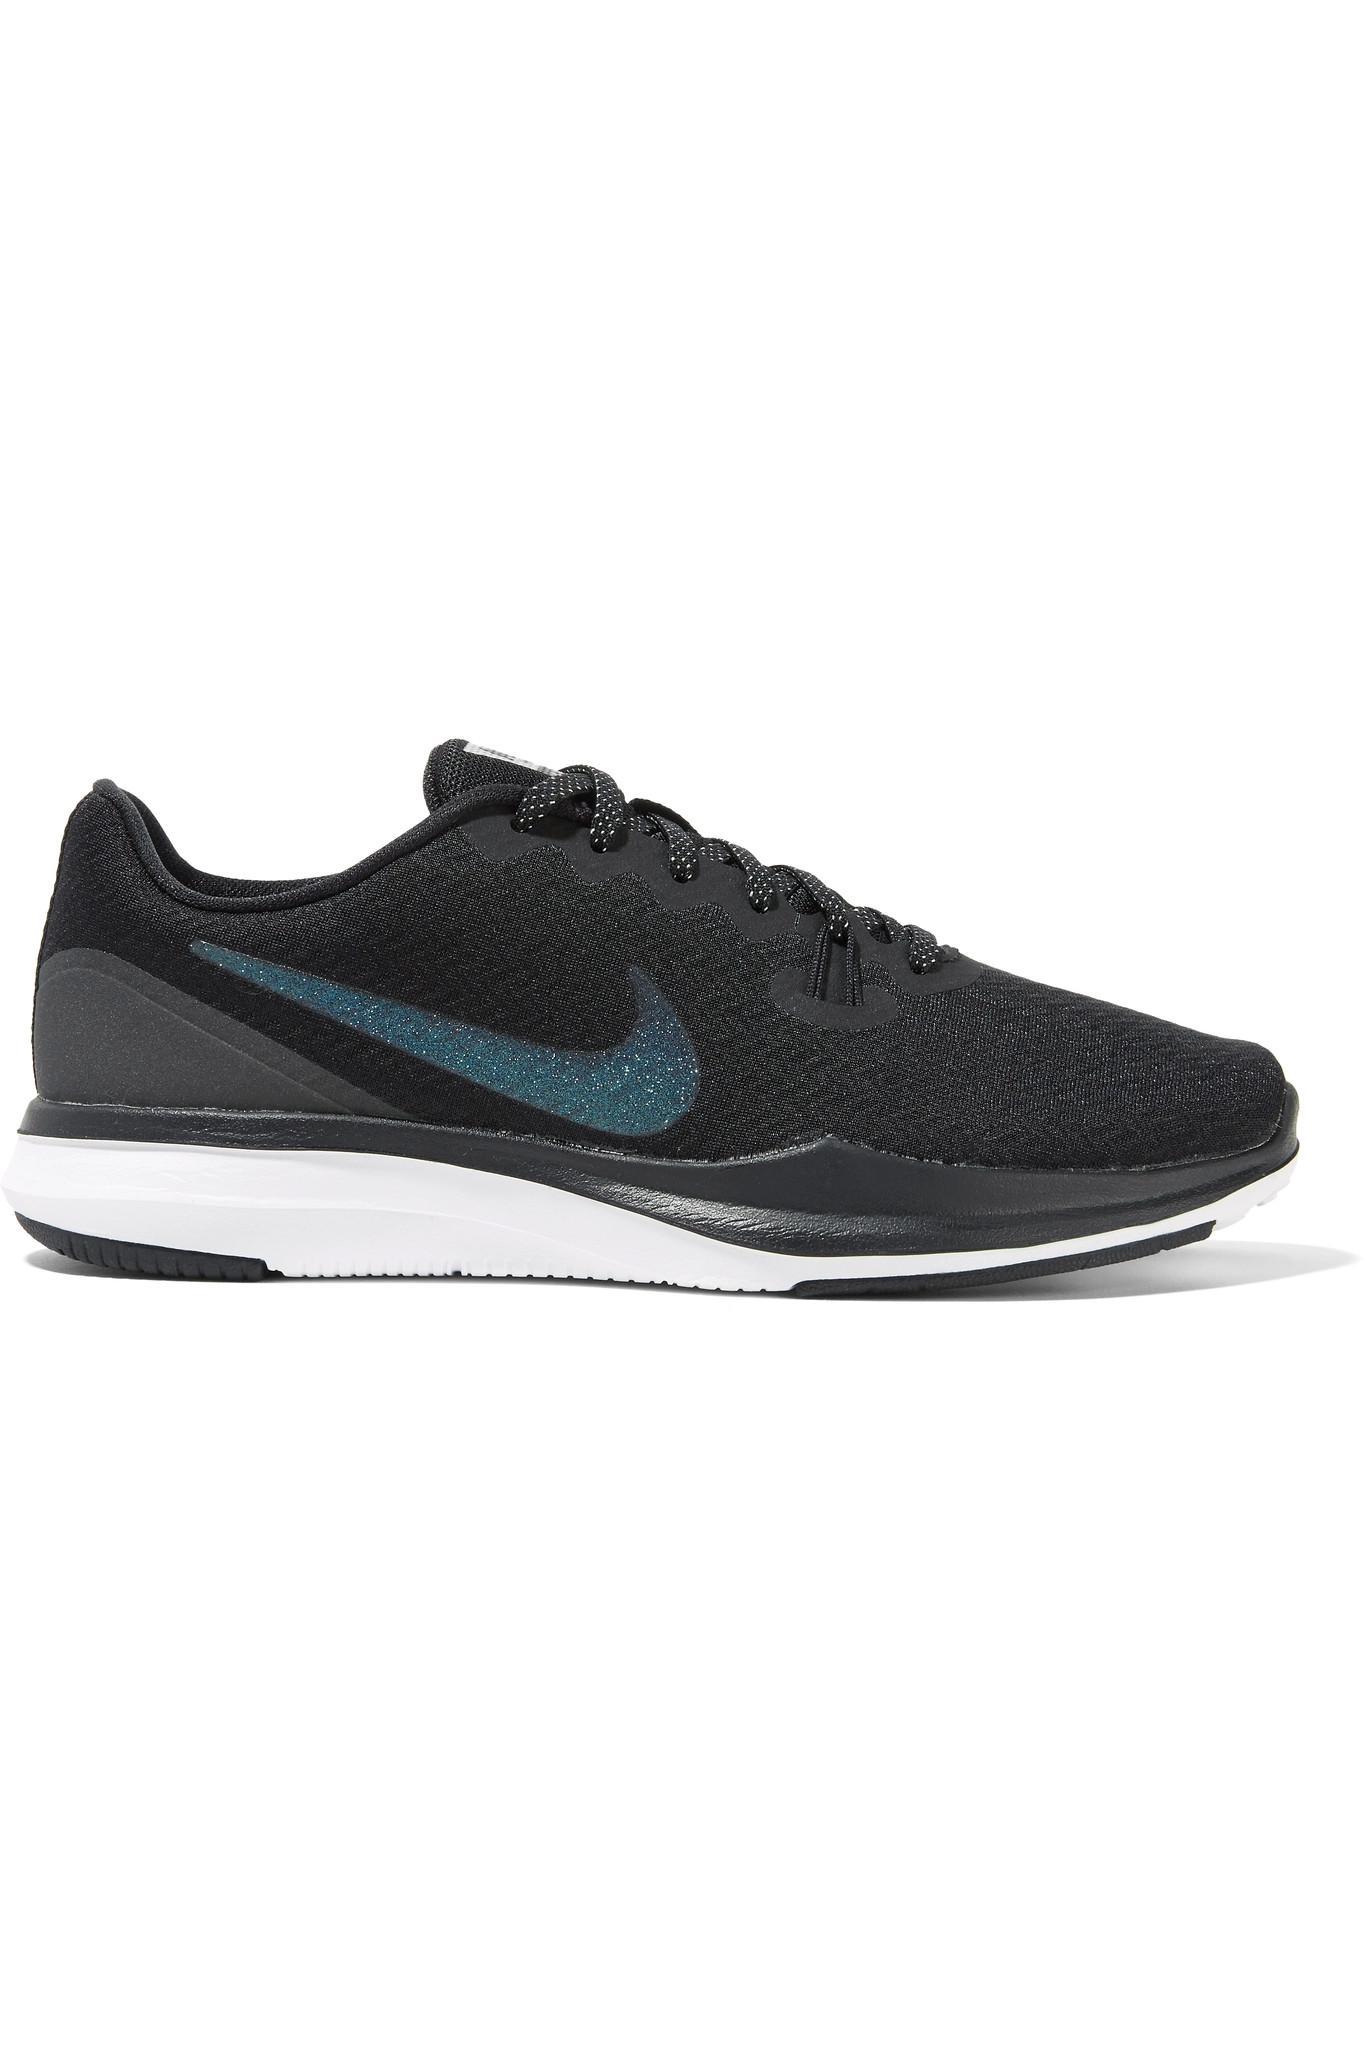 Nike. Women's Black Tr 7 ...